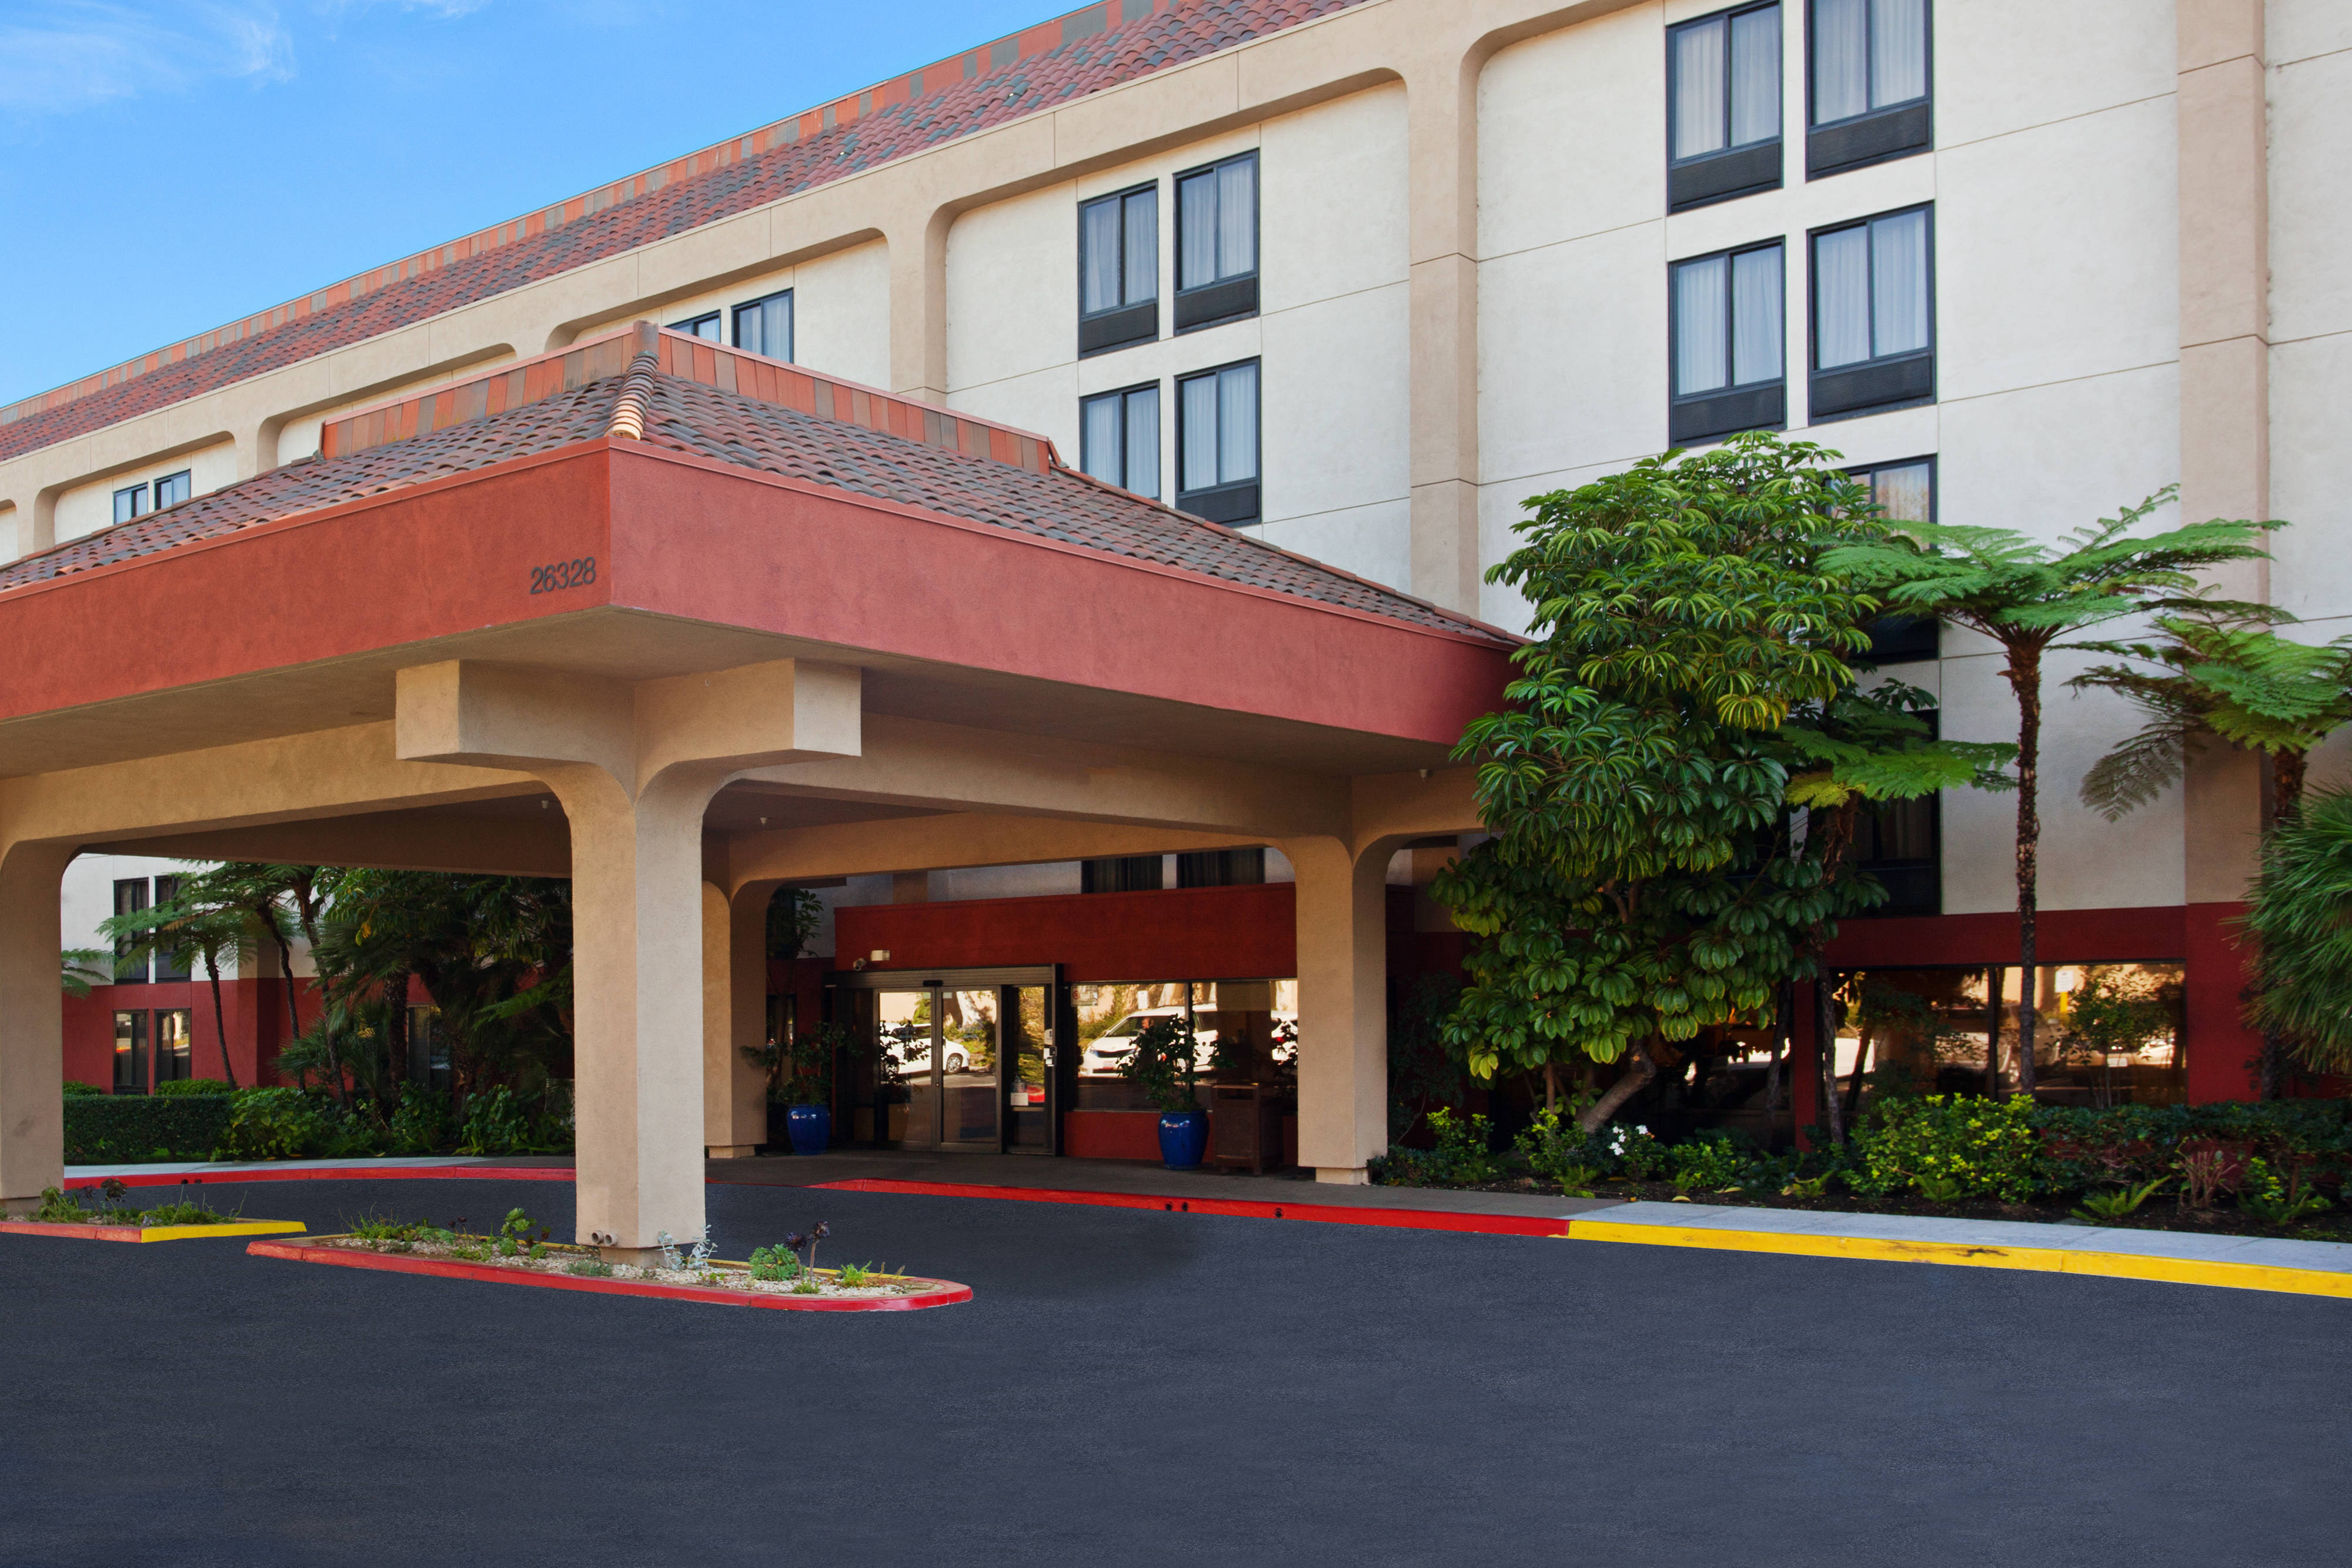 Fairfield Inn By Marriott Mission Viejo / Orange County